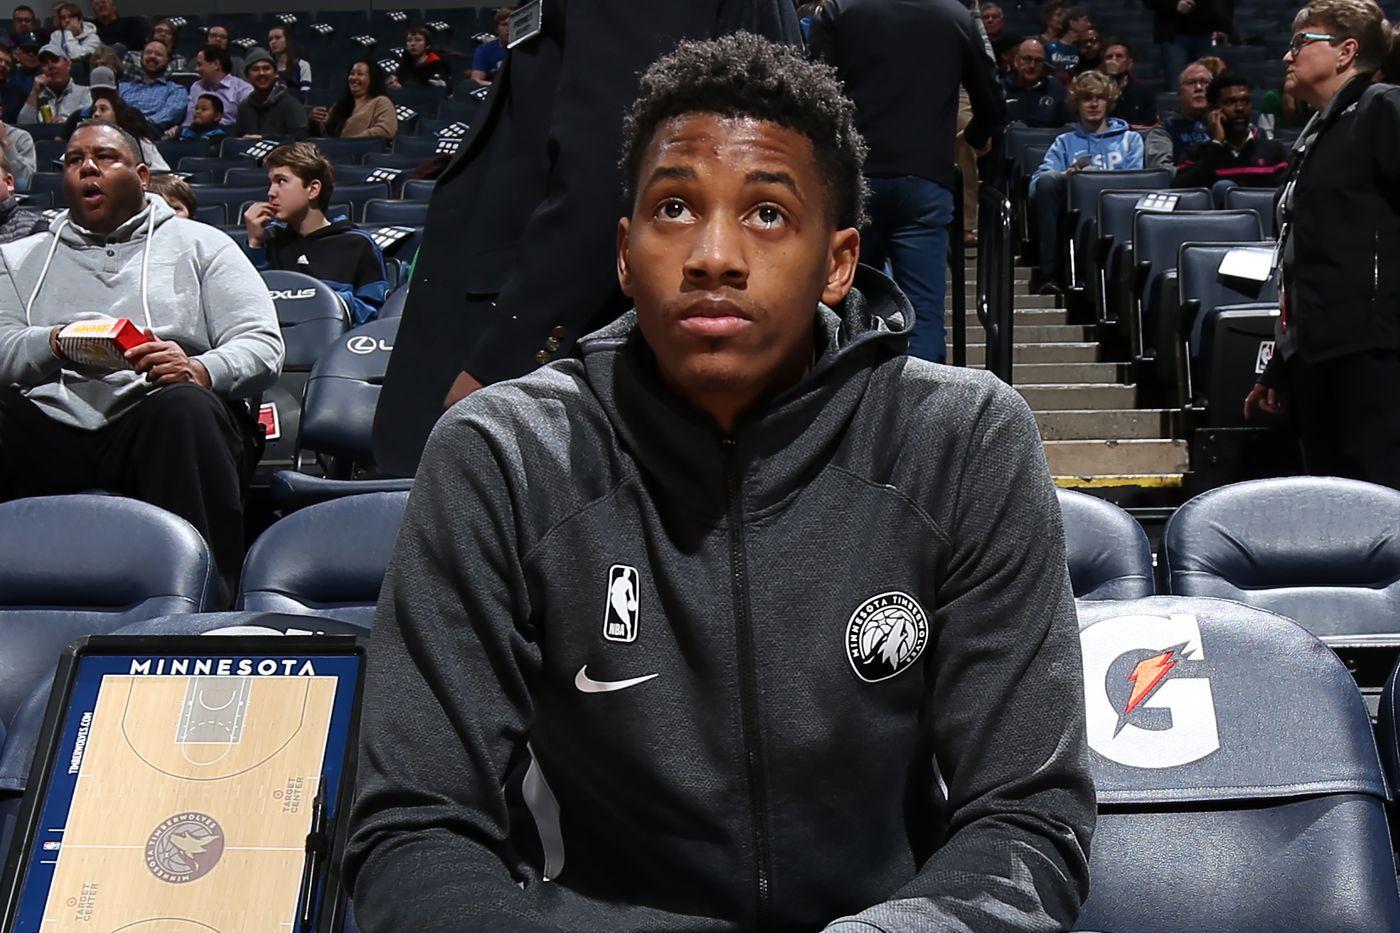 Nba Draft Rumors Wolves Celtics Pelicans Talking With Atlanta Hawks Peachtree Hoops